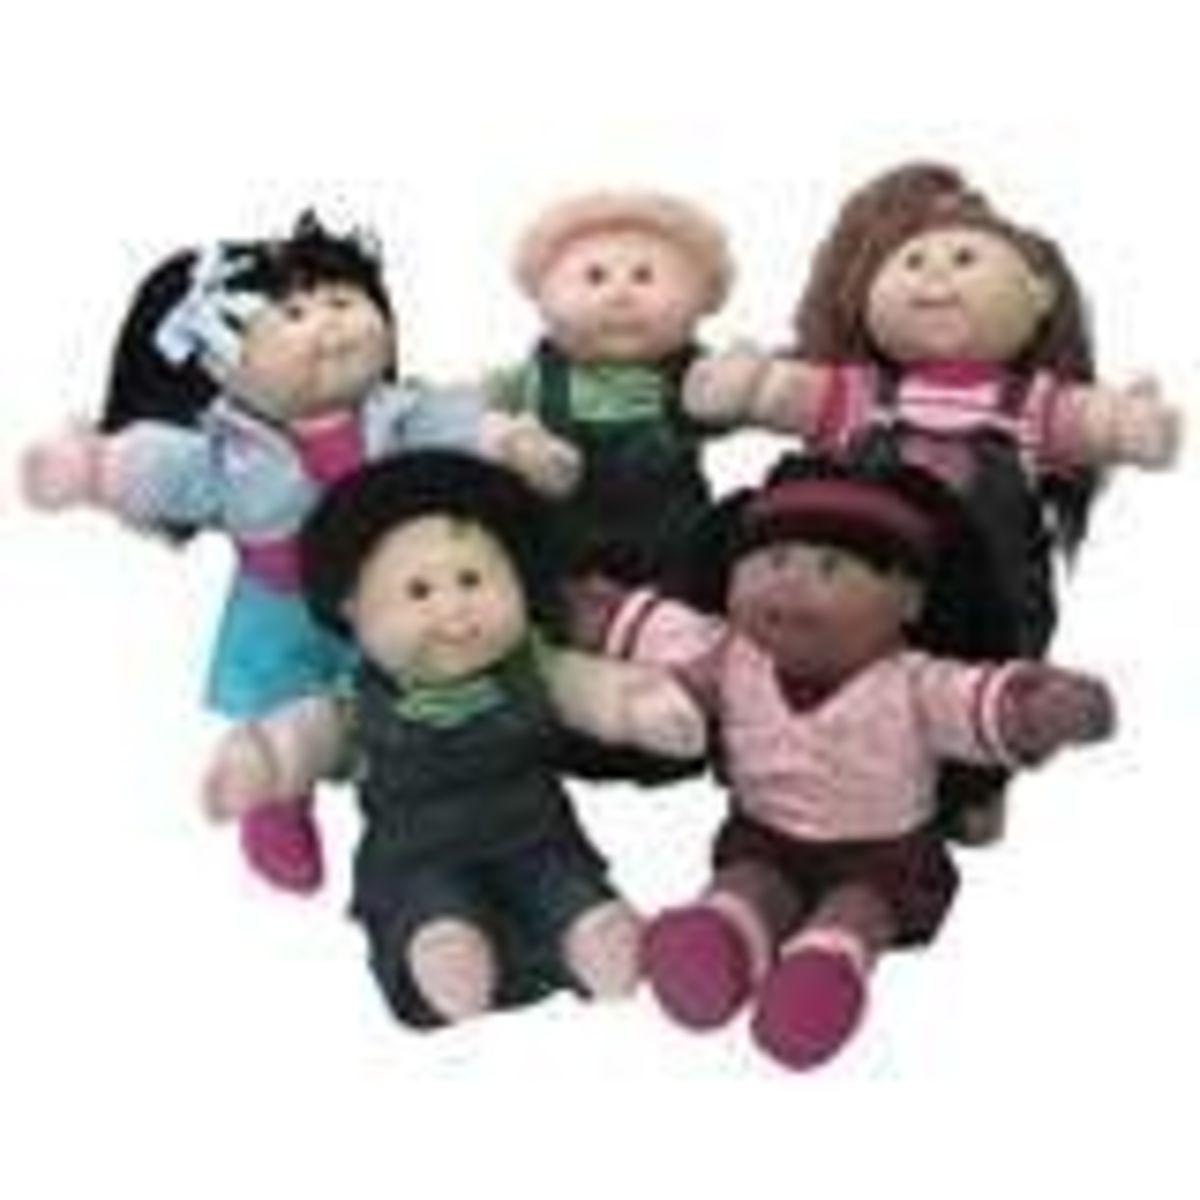 Xavier Roberts Little People dolls